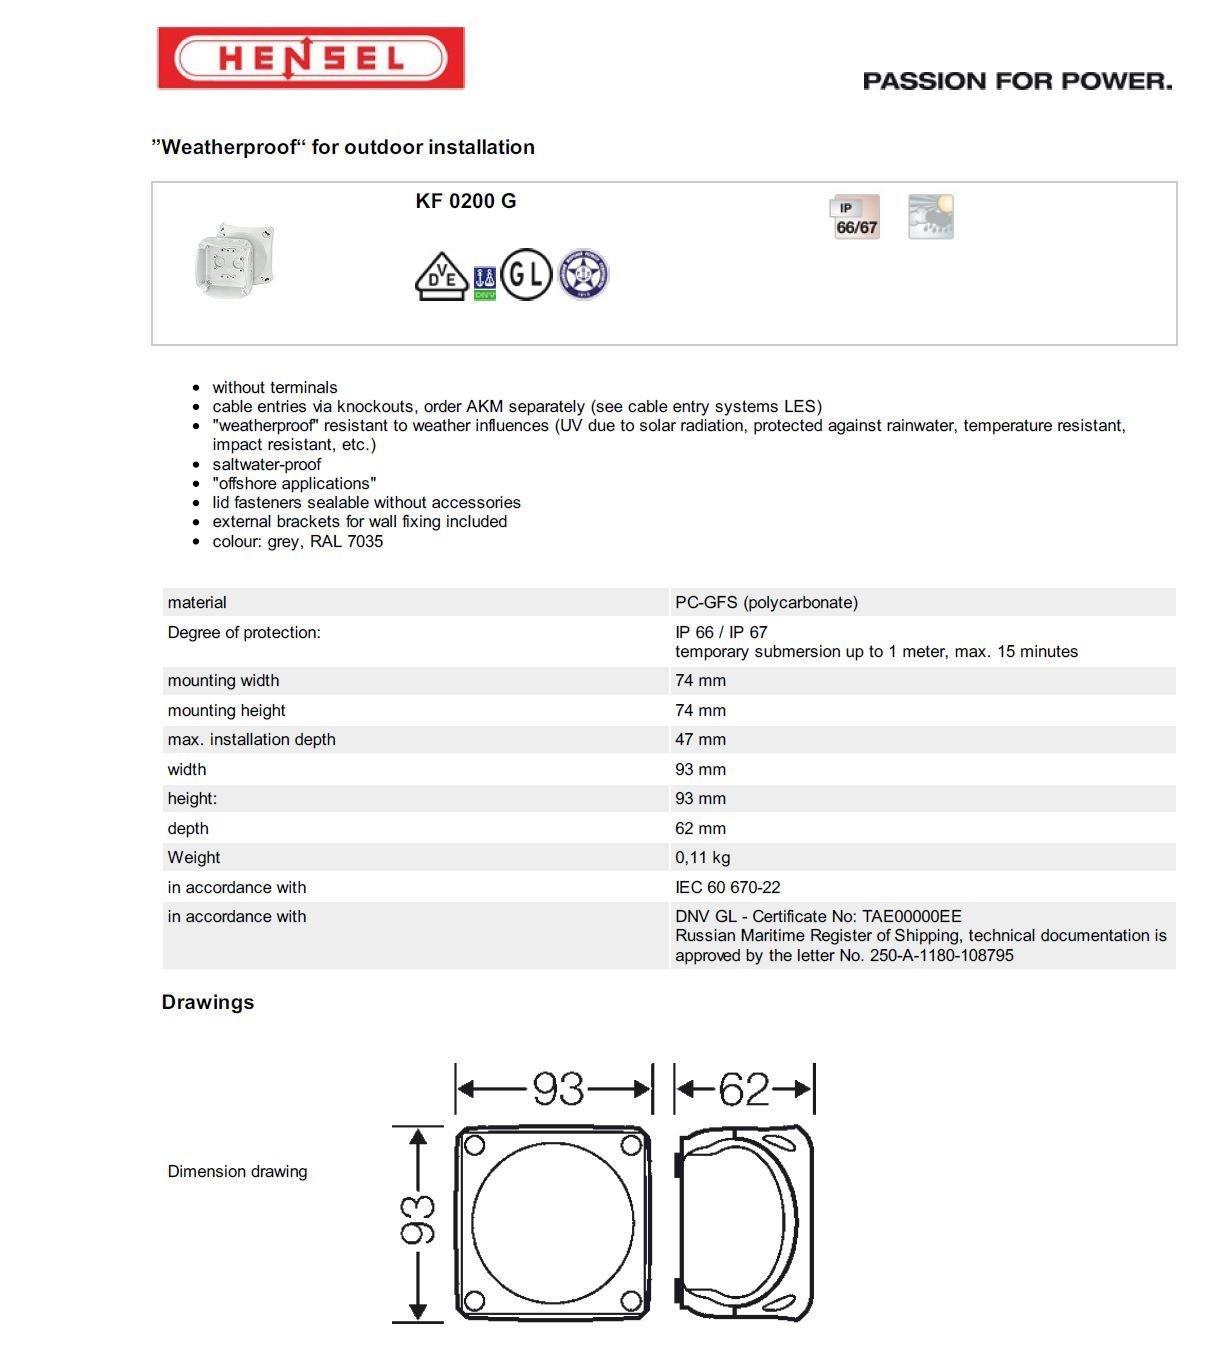 Hensel KF 0200/G Polycarbonate Electrical Junction Box/ /Electrical Junction Boxes Grey, 93/mm, 62/mm, 93/mm, 110/g